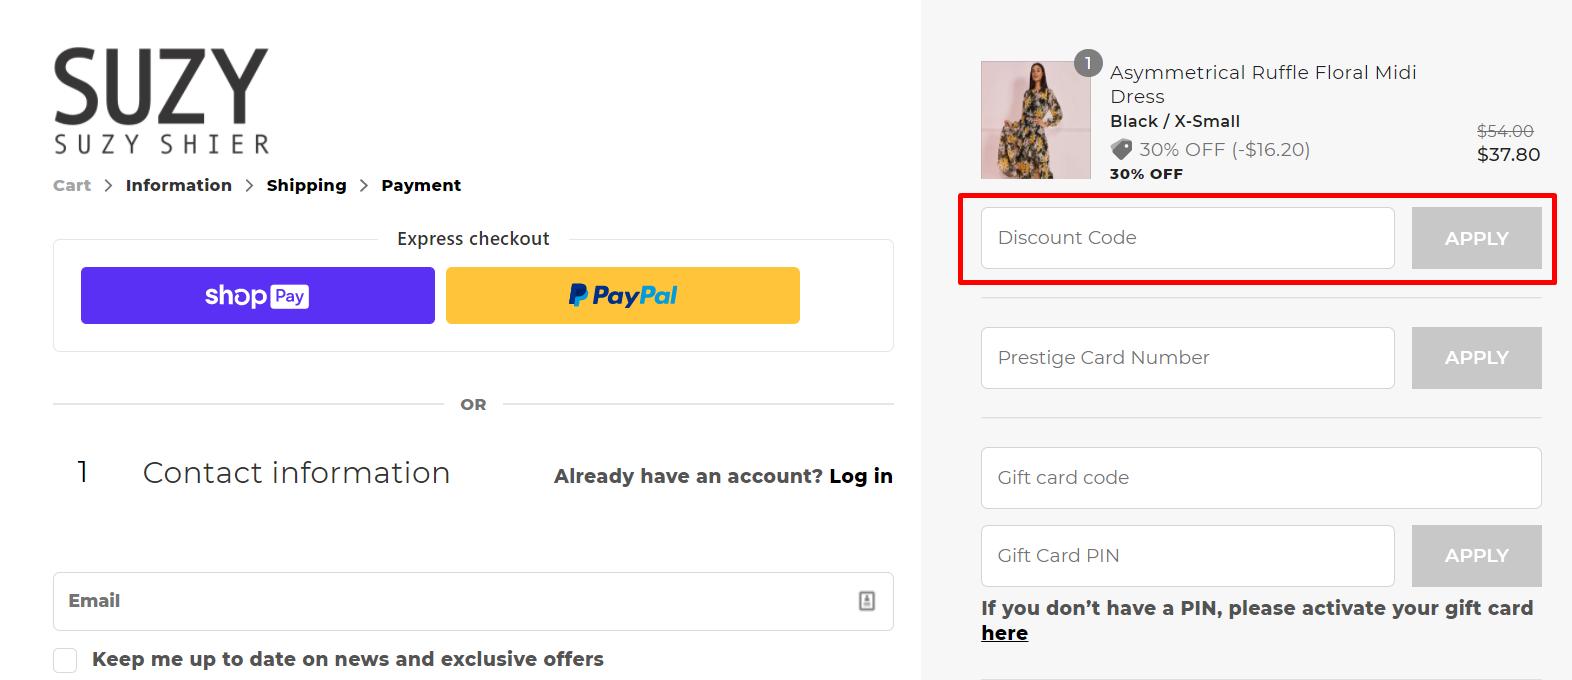 How do I use my Suzy Shier discount code?